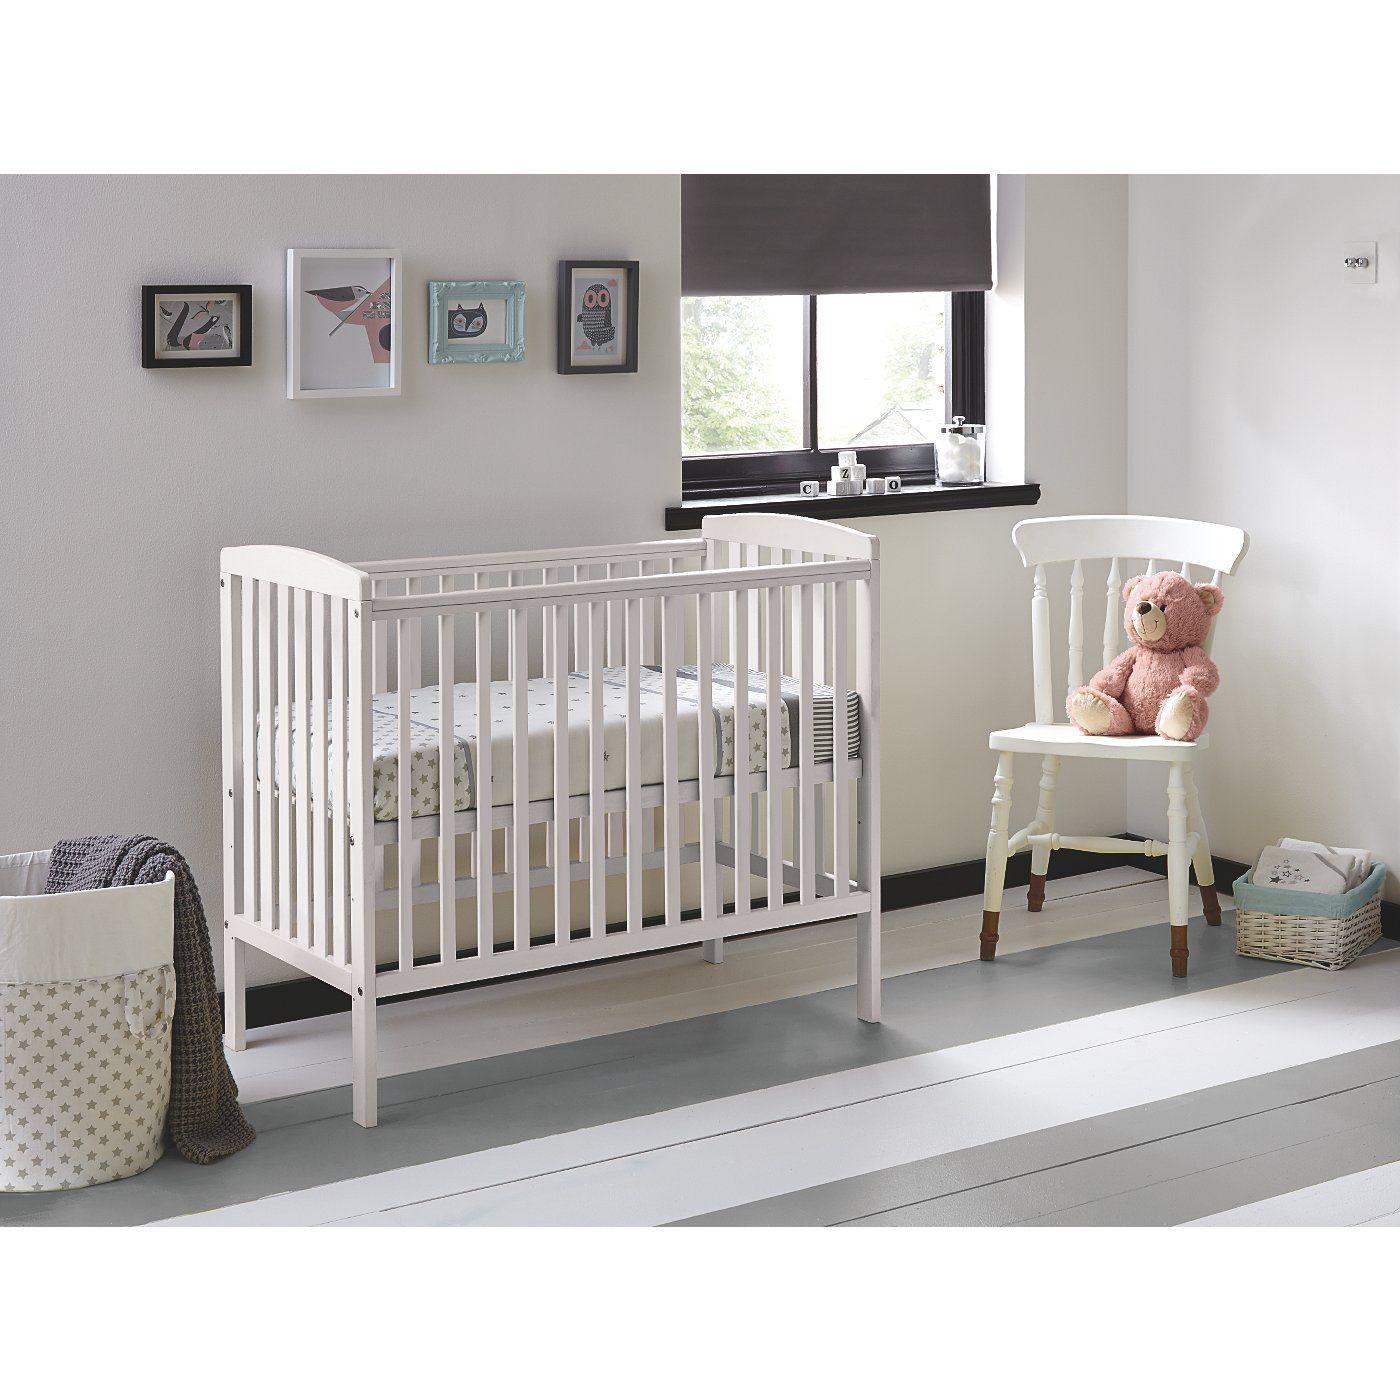 compact nursery furniture. Buy Kinder Valley Kai Compact Cot In White From Our Nursery Furniture Range Today ASDA R